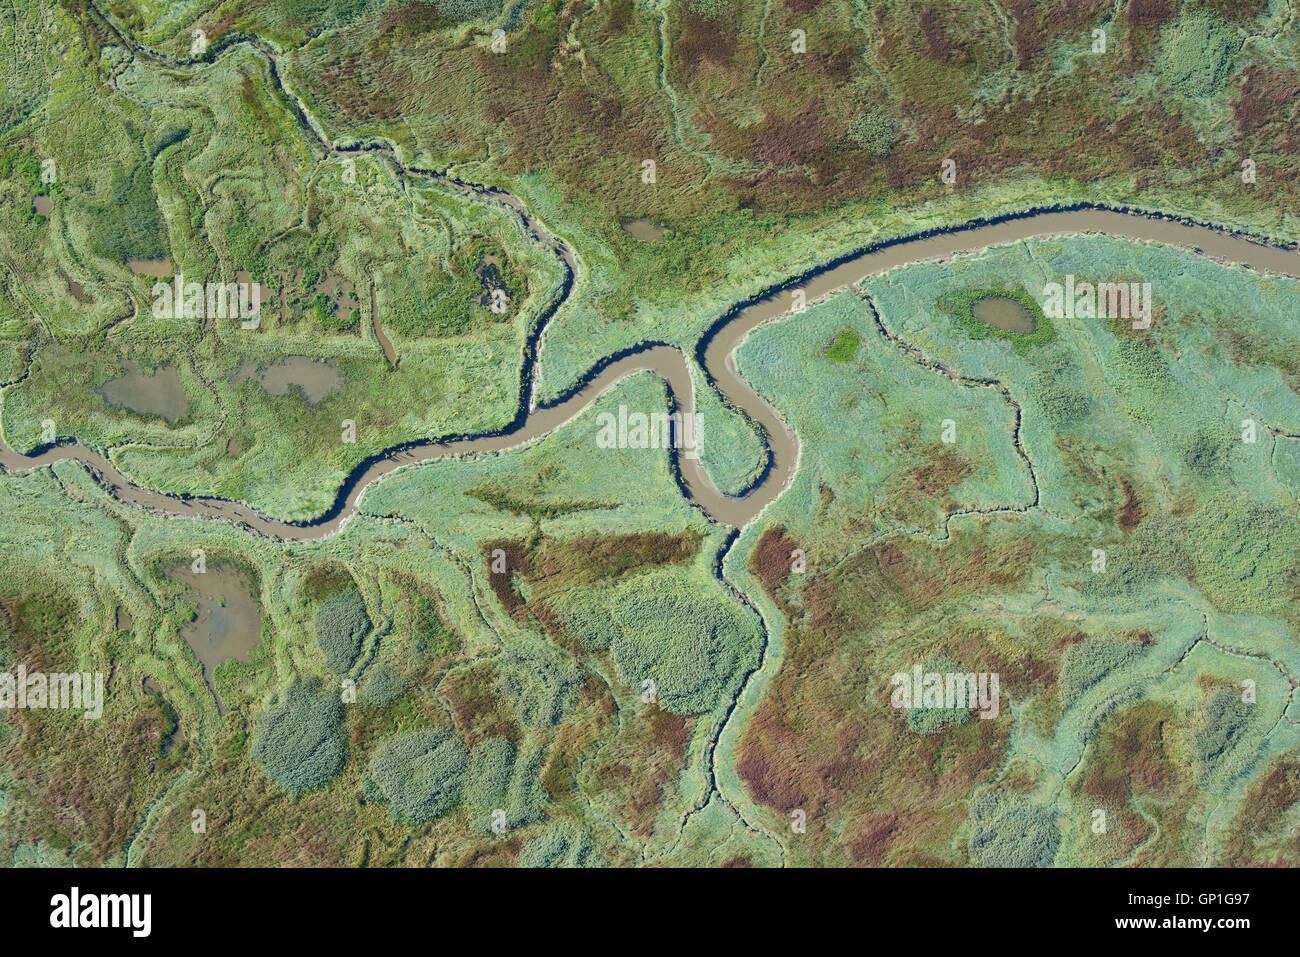 SALT MARSH WILDERNESS ON THE SCHELDT ESTUARY (aerial view). Verdronken Land van Saeftinghe, Zeeland, Netherlands. - Stock Image